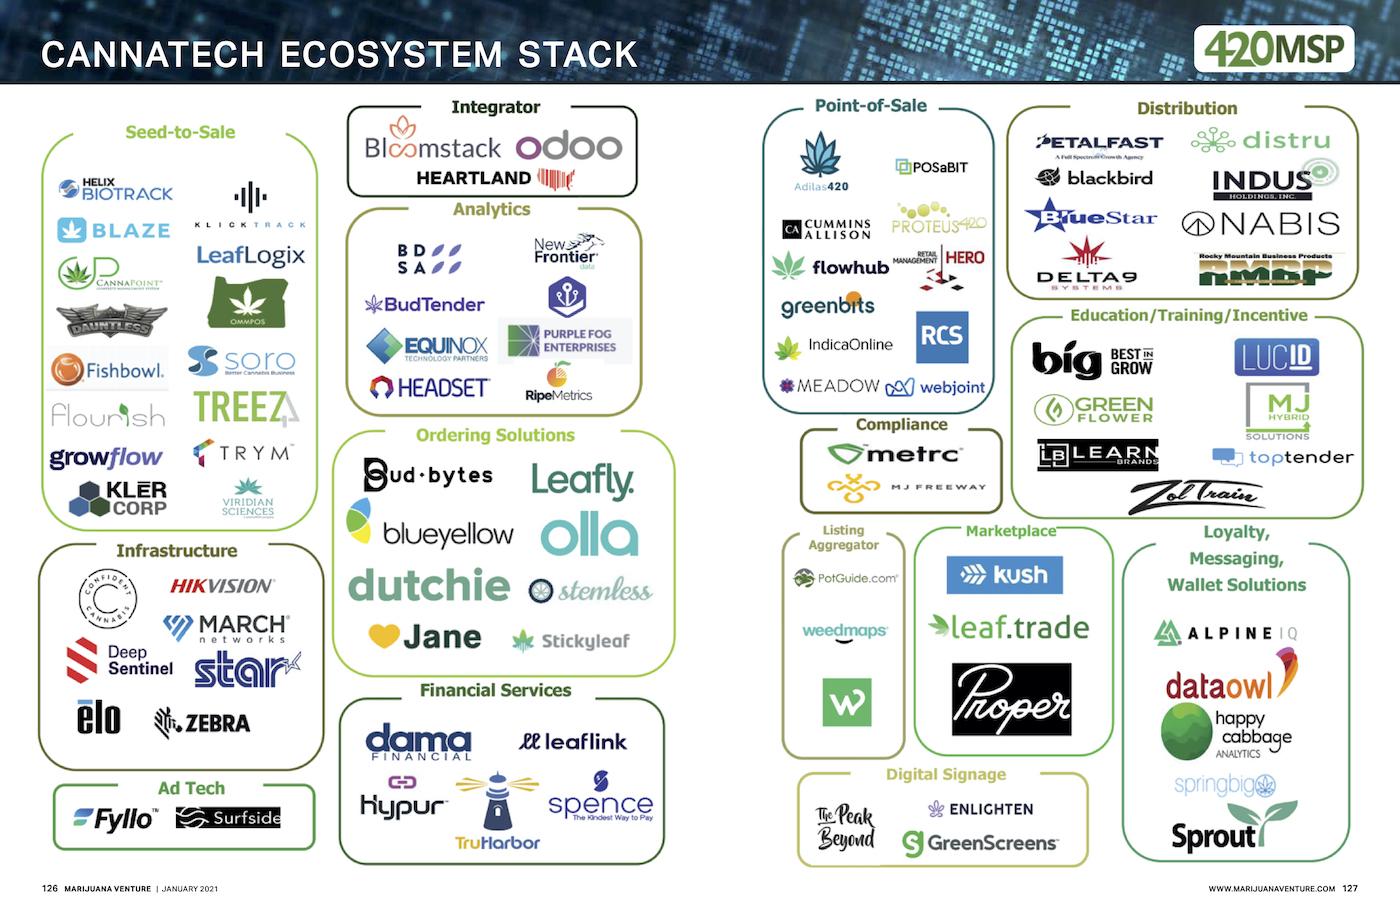 Cannatech Ecosystem Stack